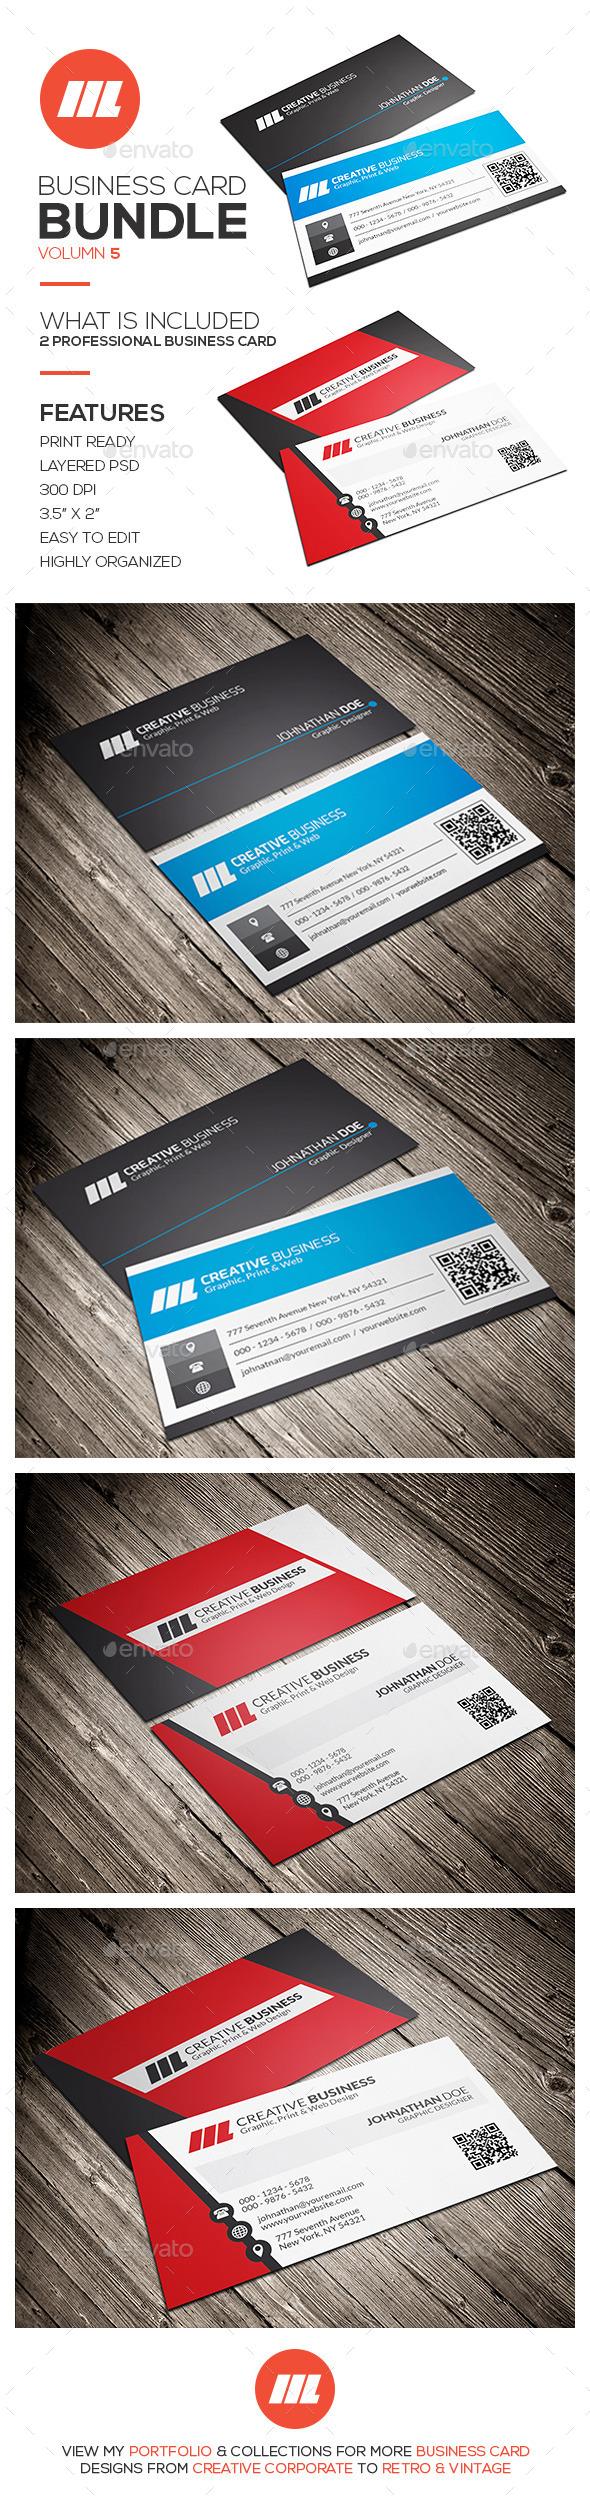 GraphicRiver Business Card Bundle Vol 5 11452502